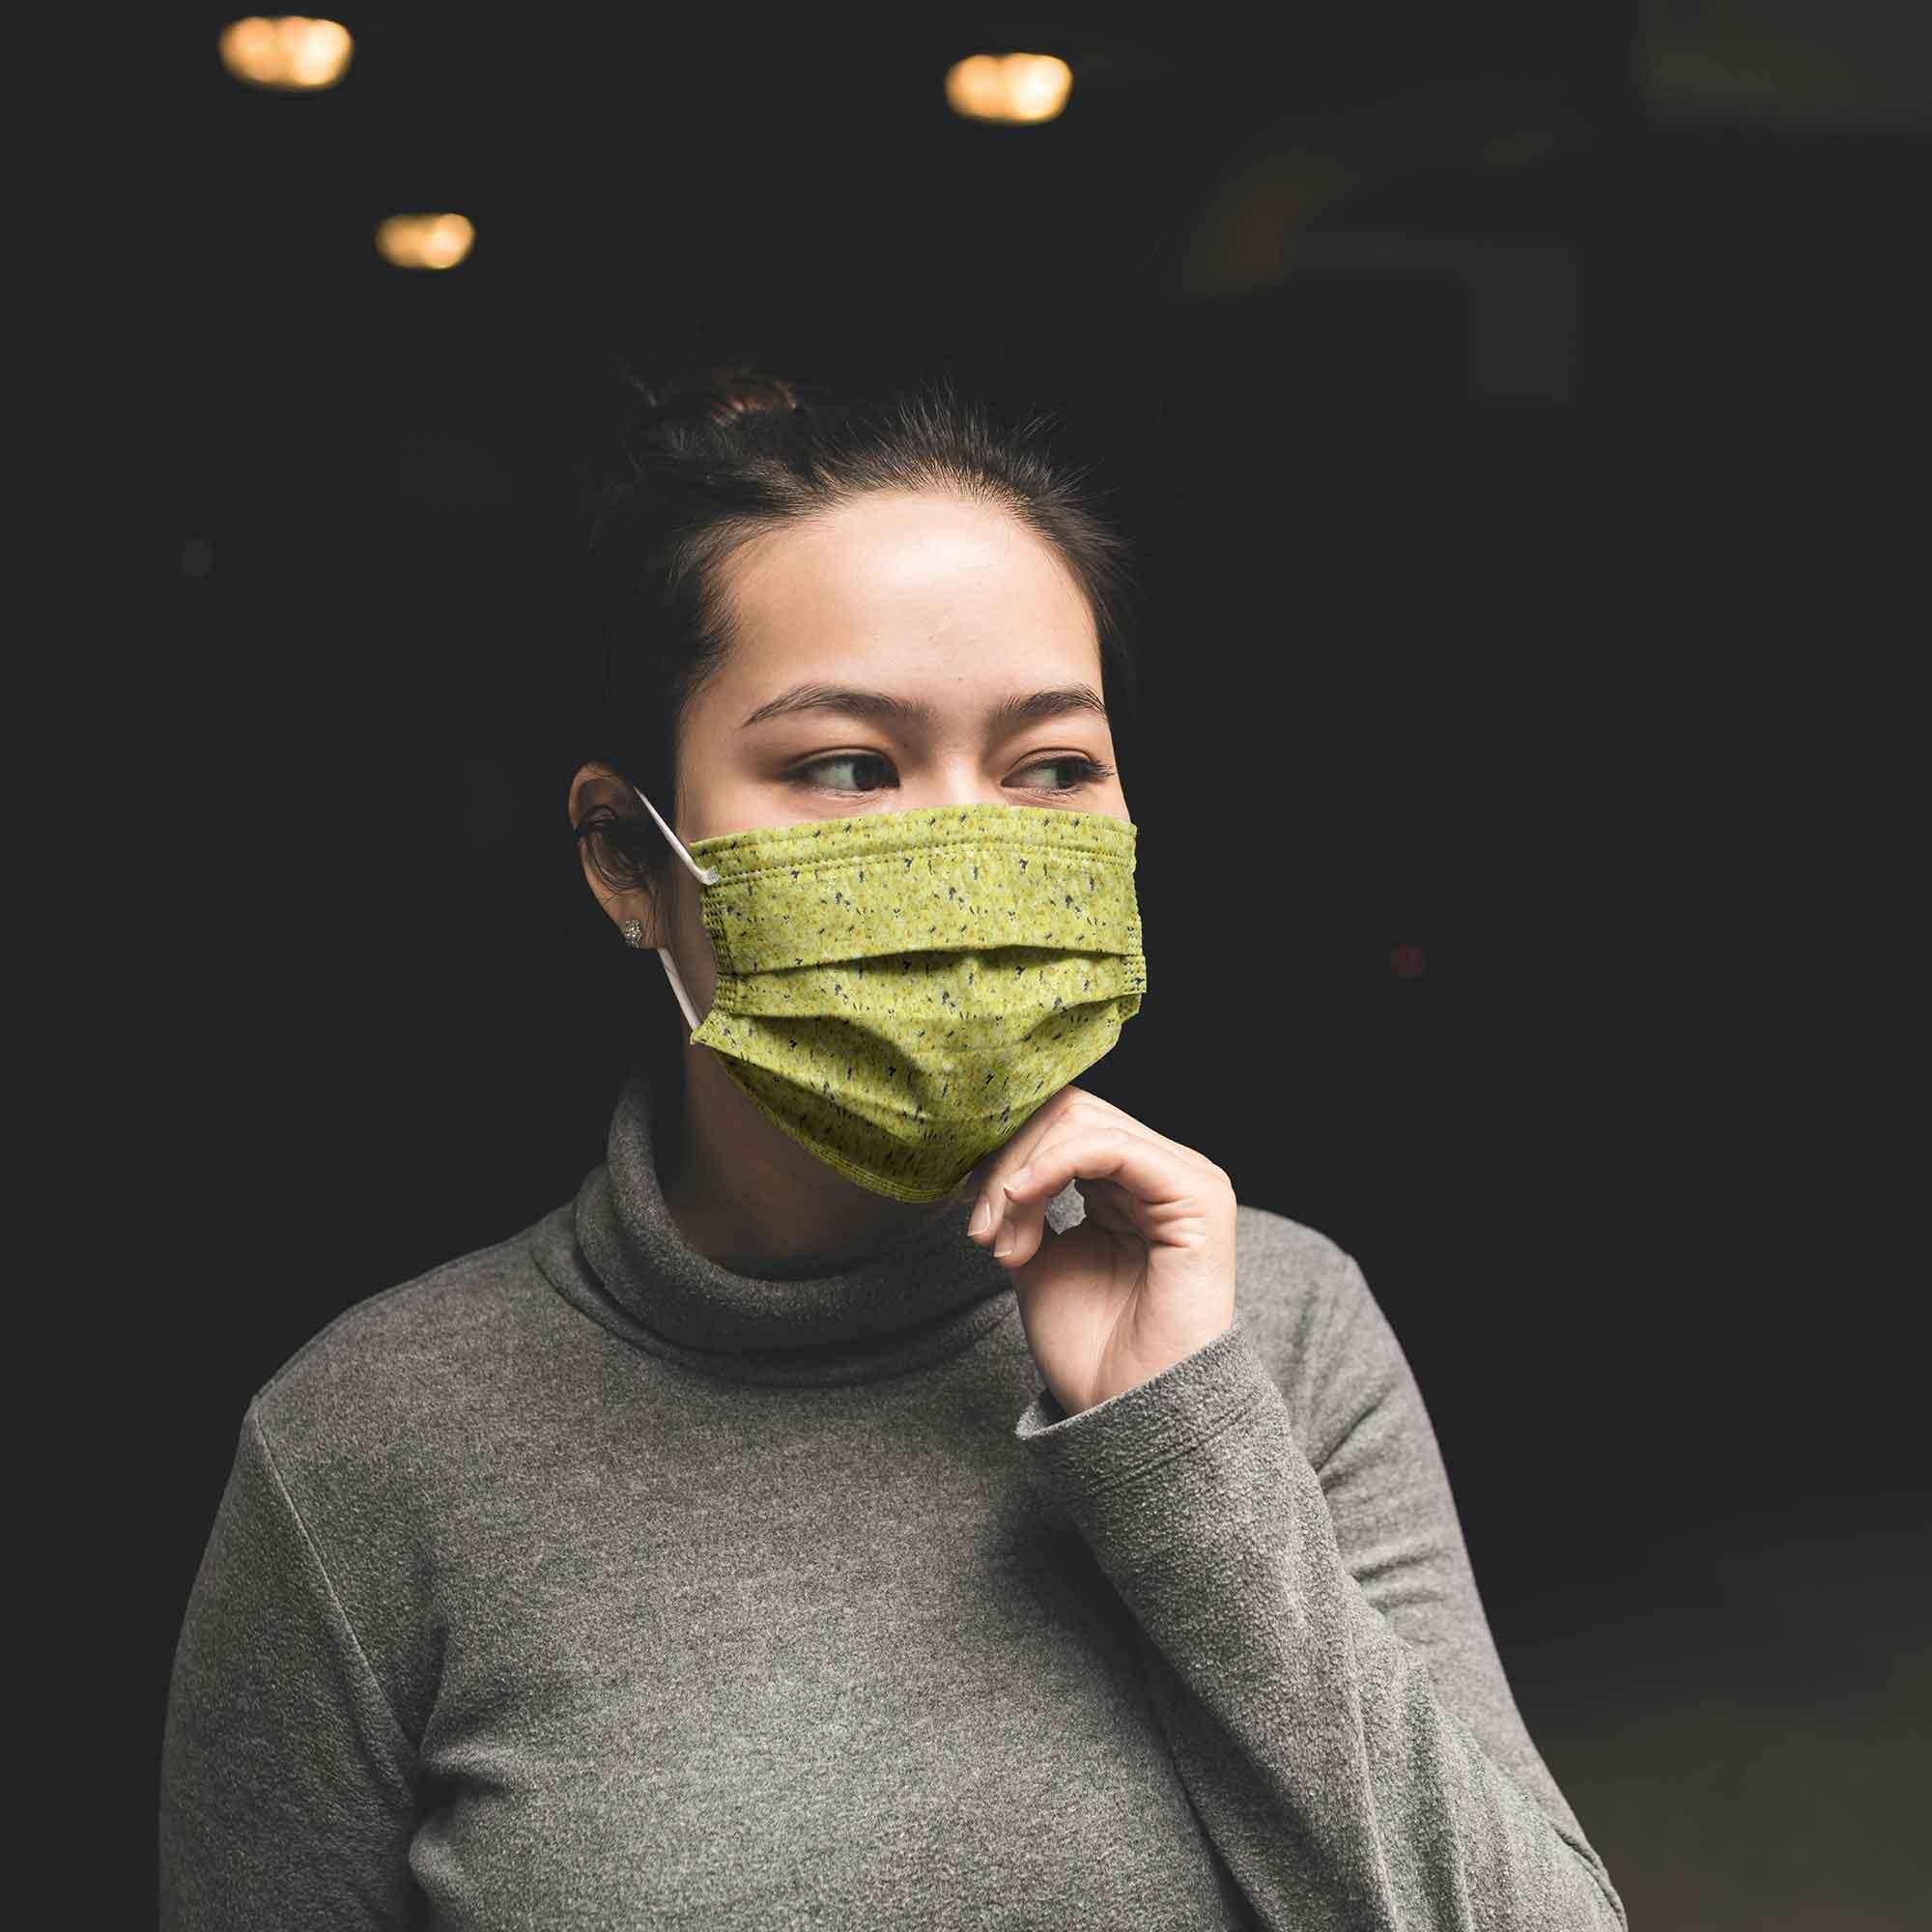 Women Face Mask Mockup